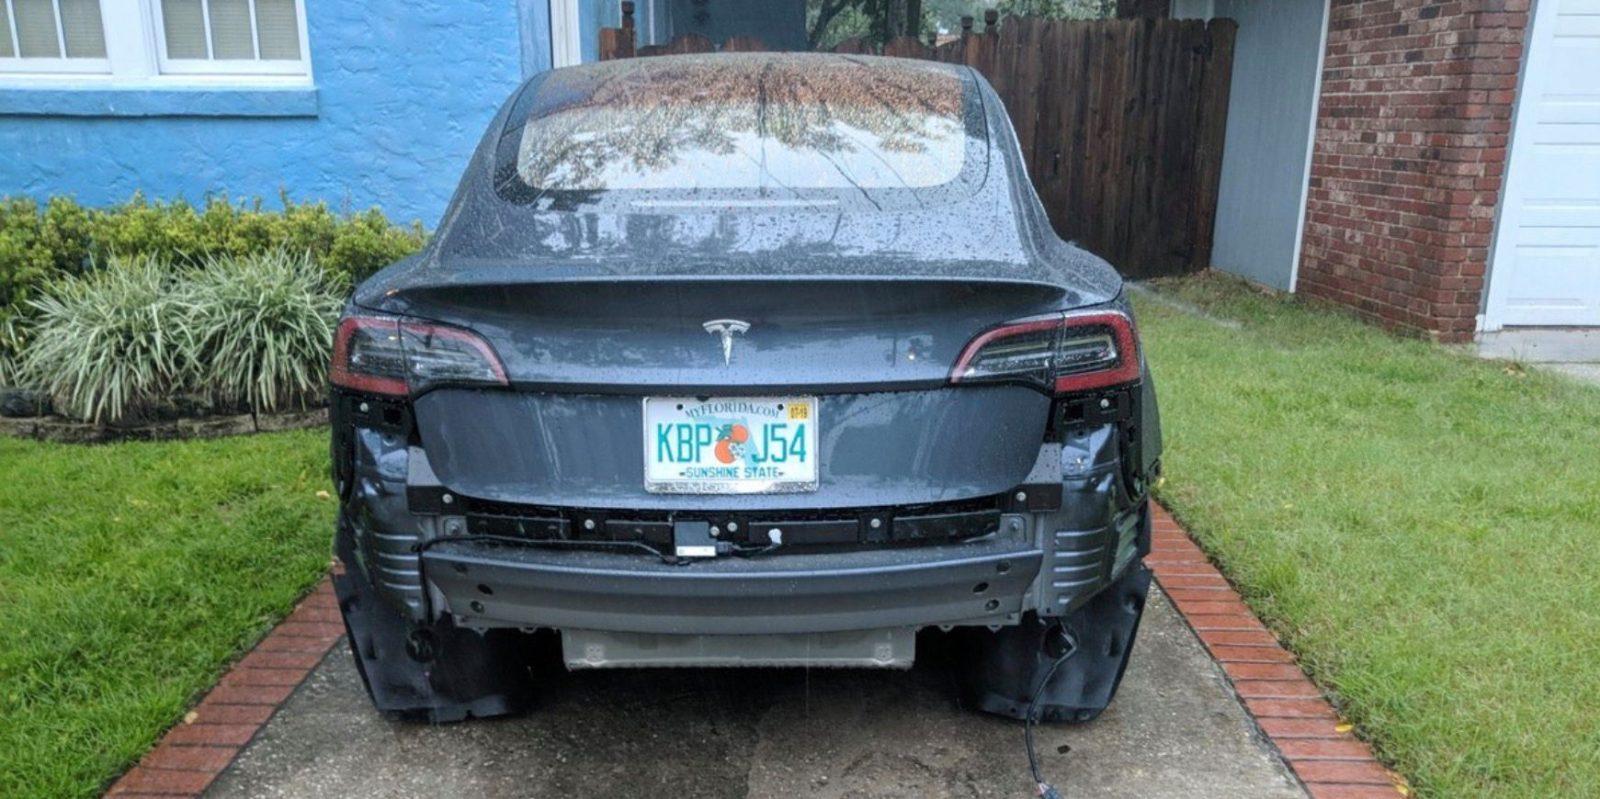 Tesla investigates why bumper broke off two Model 3 vehicles